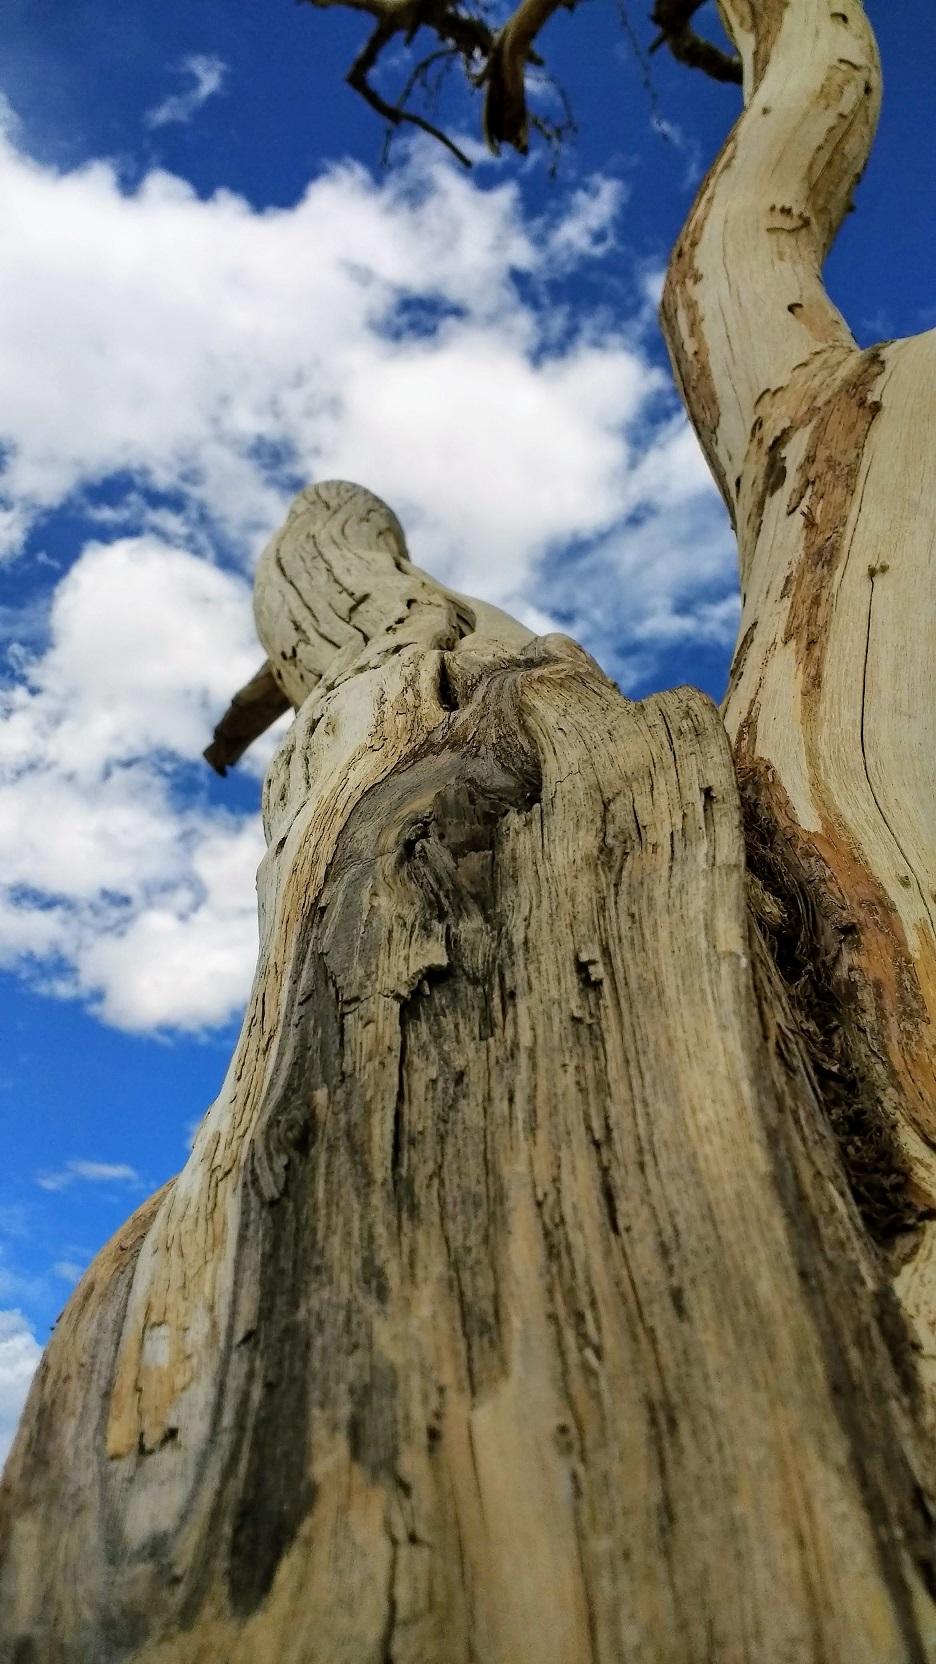 Furnace Creek Tree